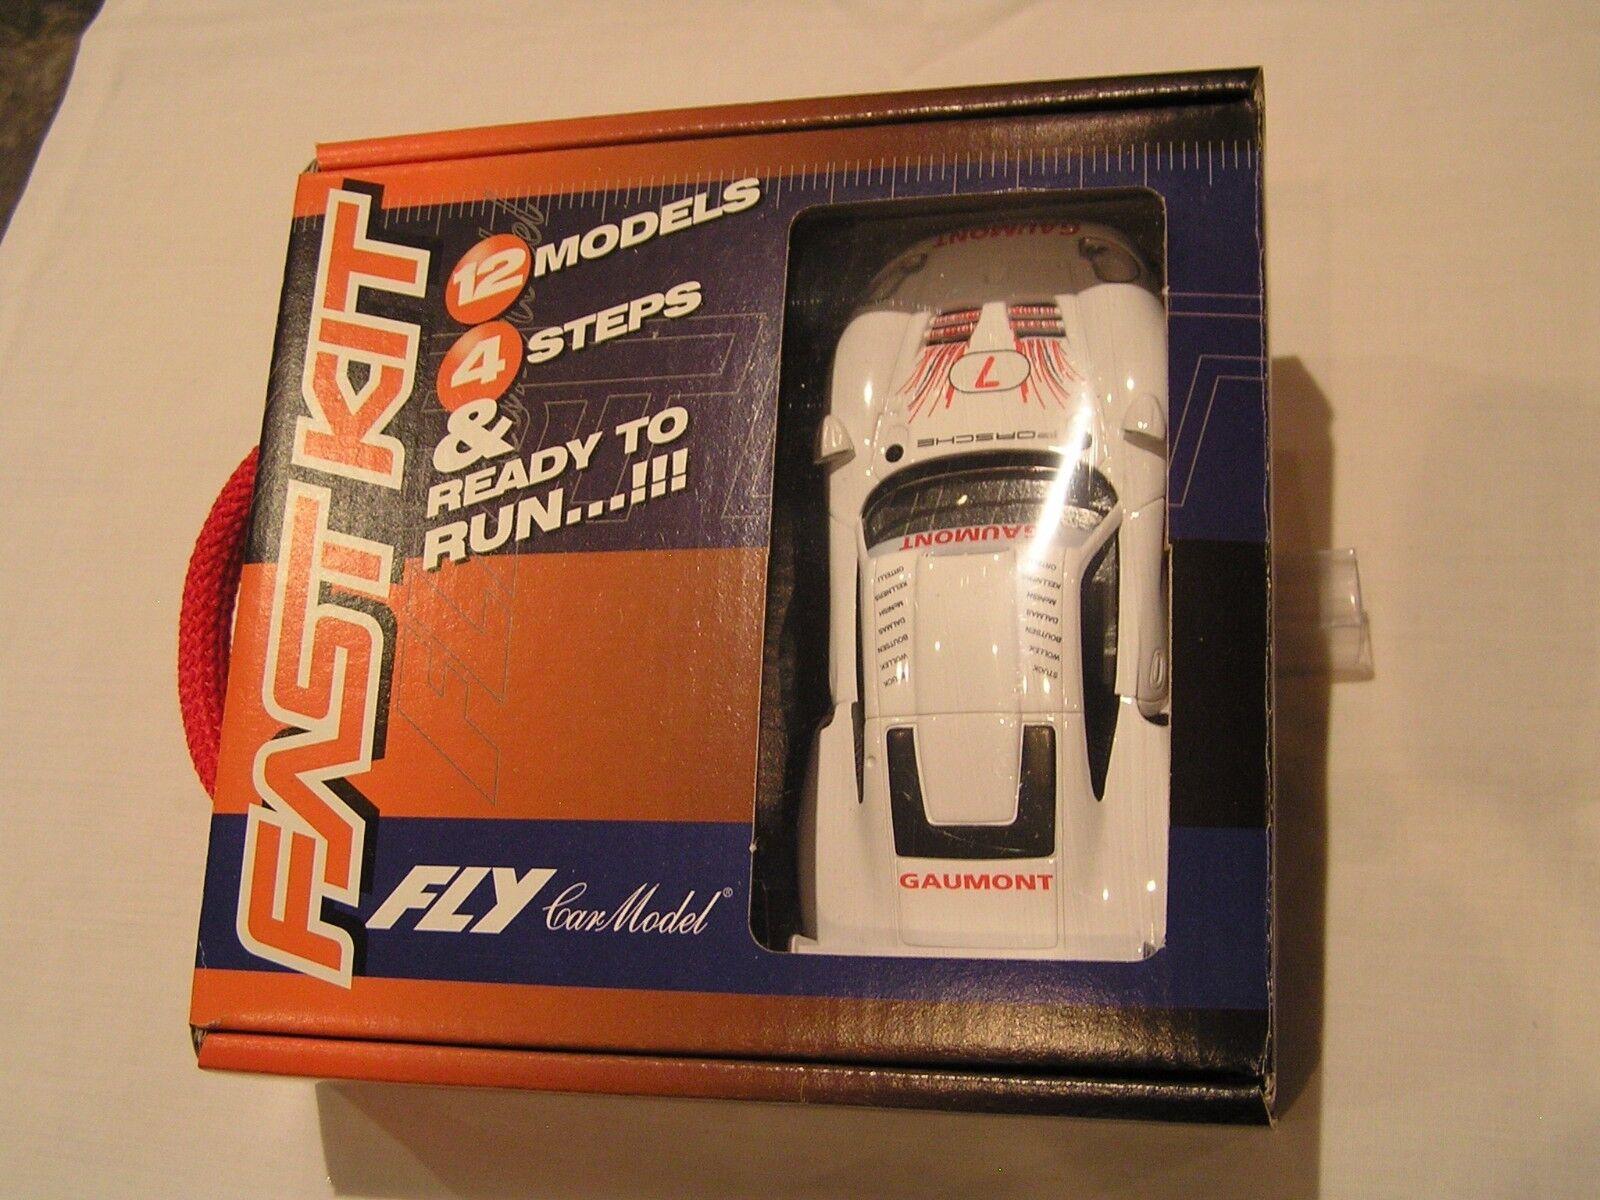 NEW FLY SLOT CAR BNIB FAST KIT SERIES (of 12) 88236 EP0019 PORSCHE 911 GT1 EVO